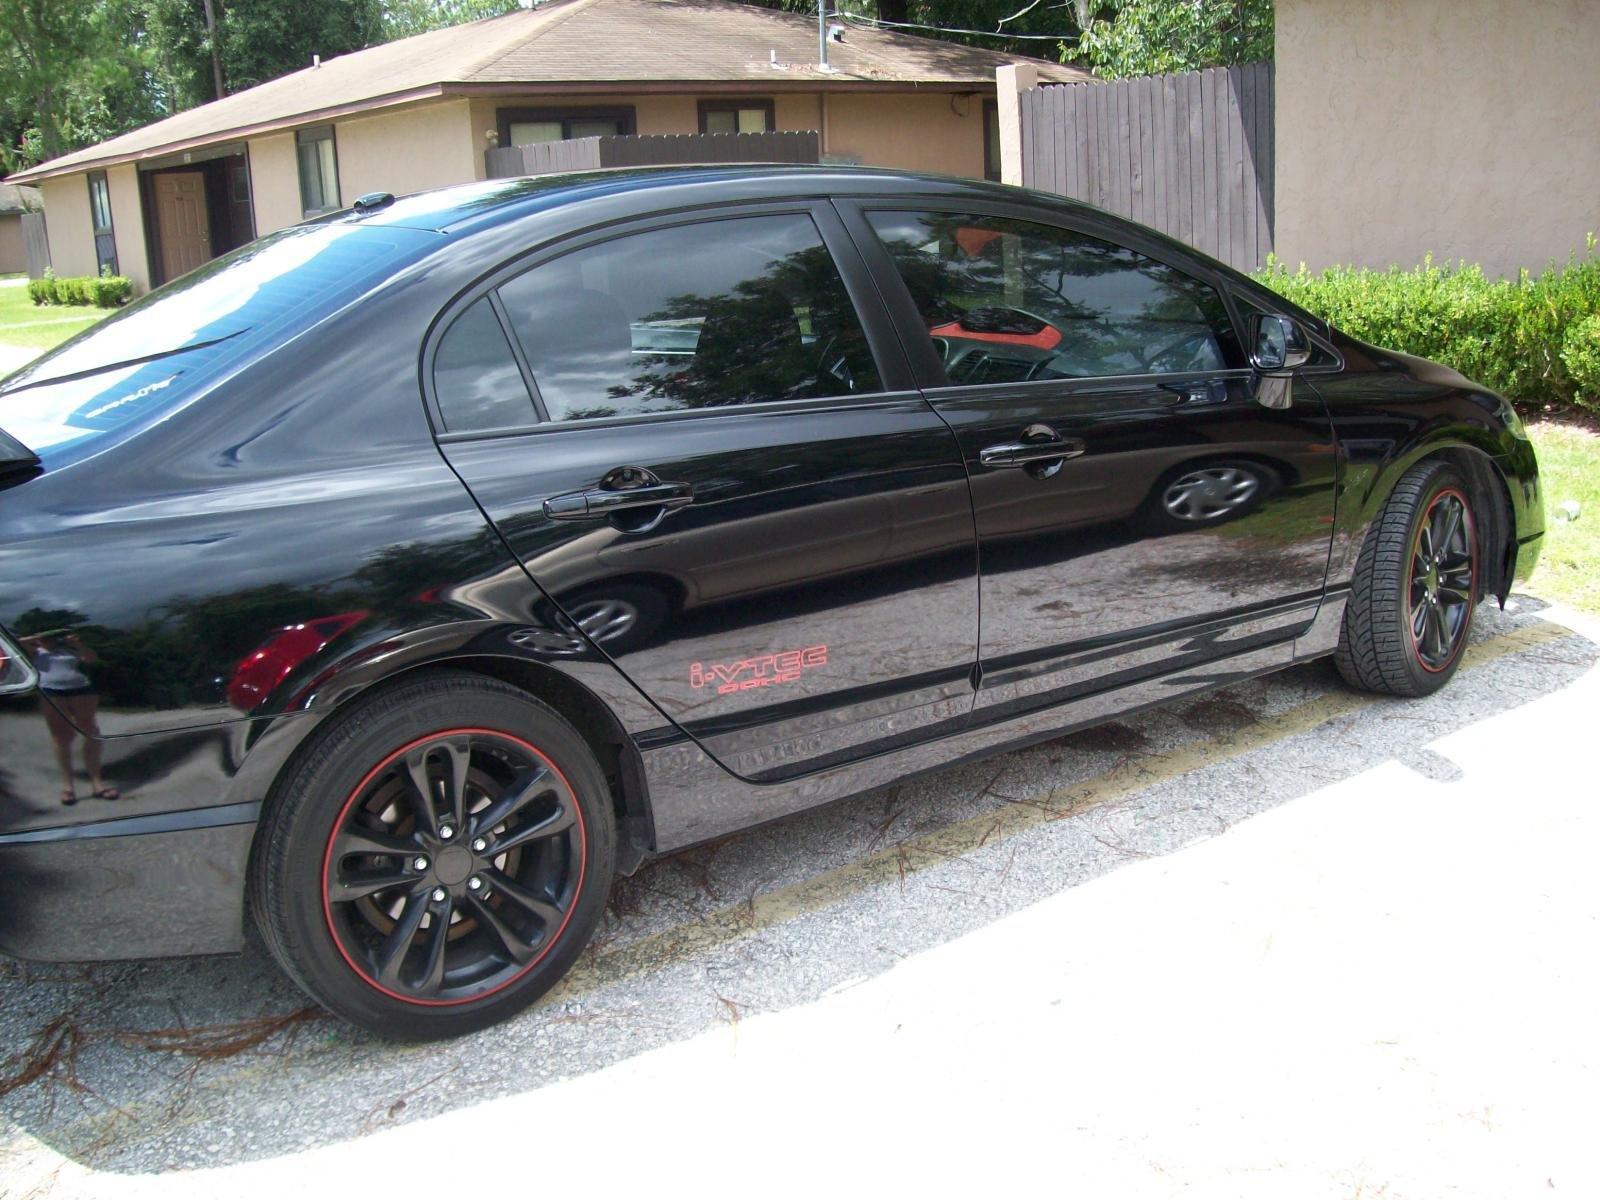 Nighthawk Black Pearl Page 21 8th Generation Honda Civic Forum